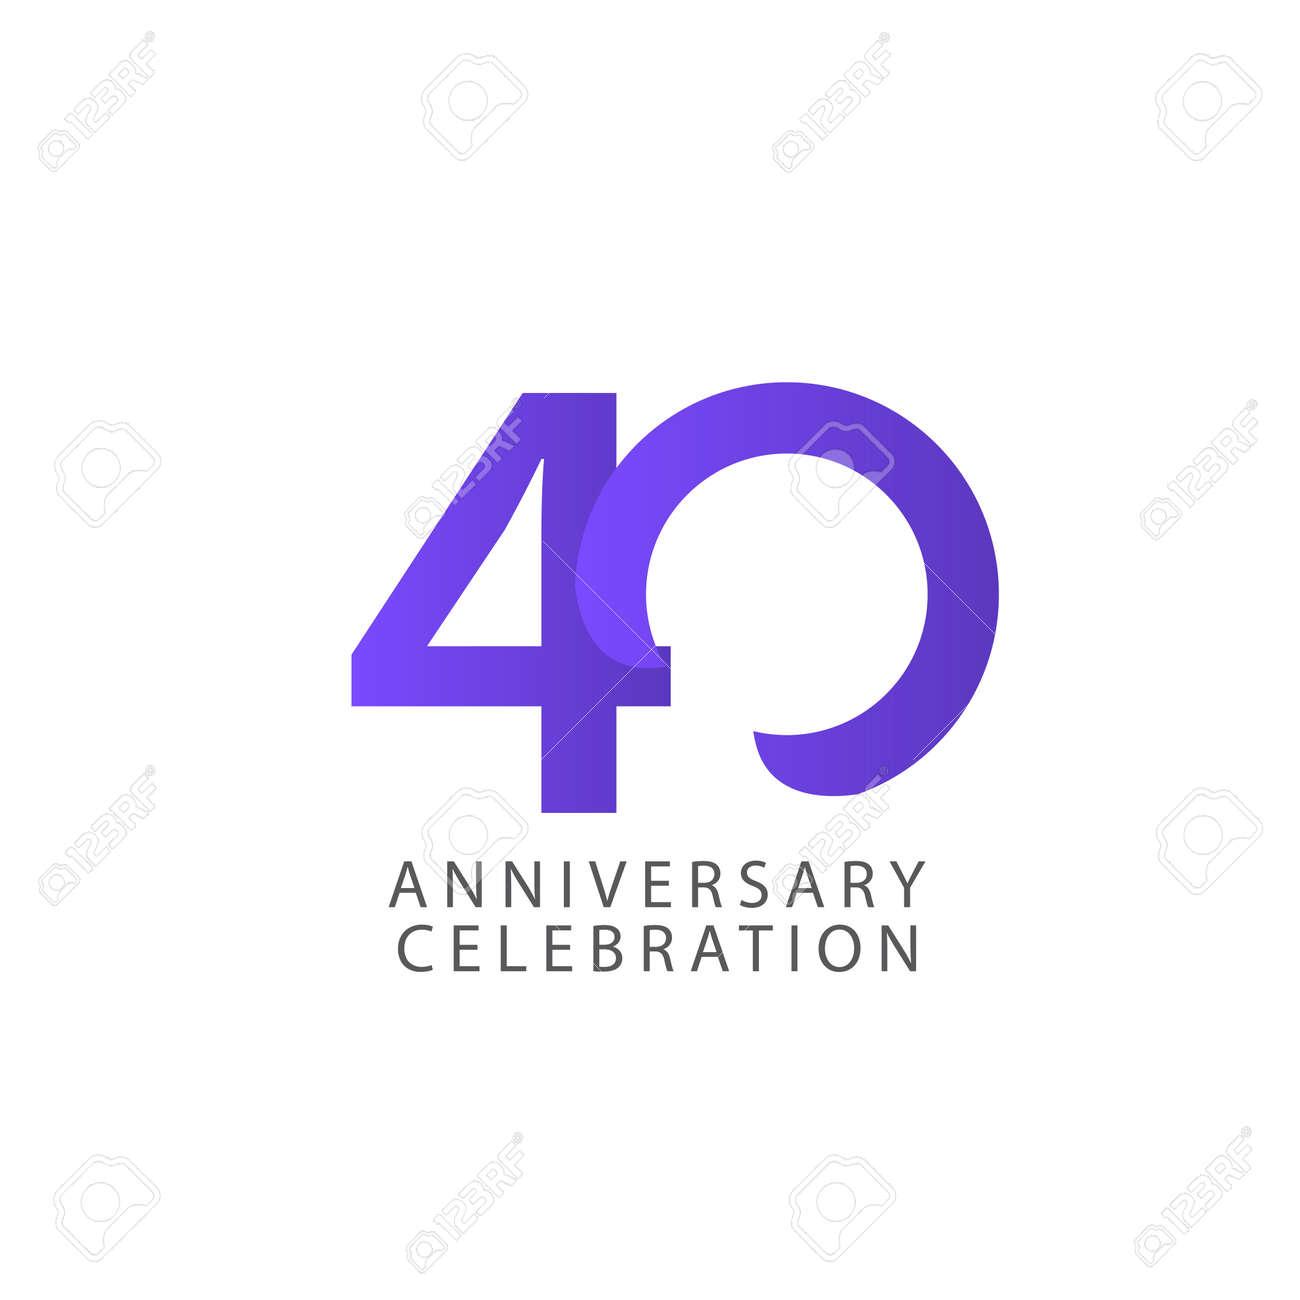 40 Years Anniversary Celebration Vector Template Design Illustration - 163698166